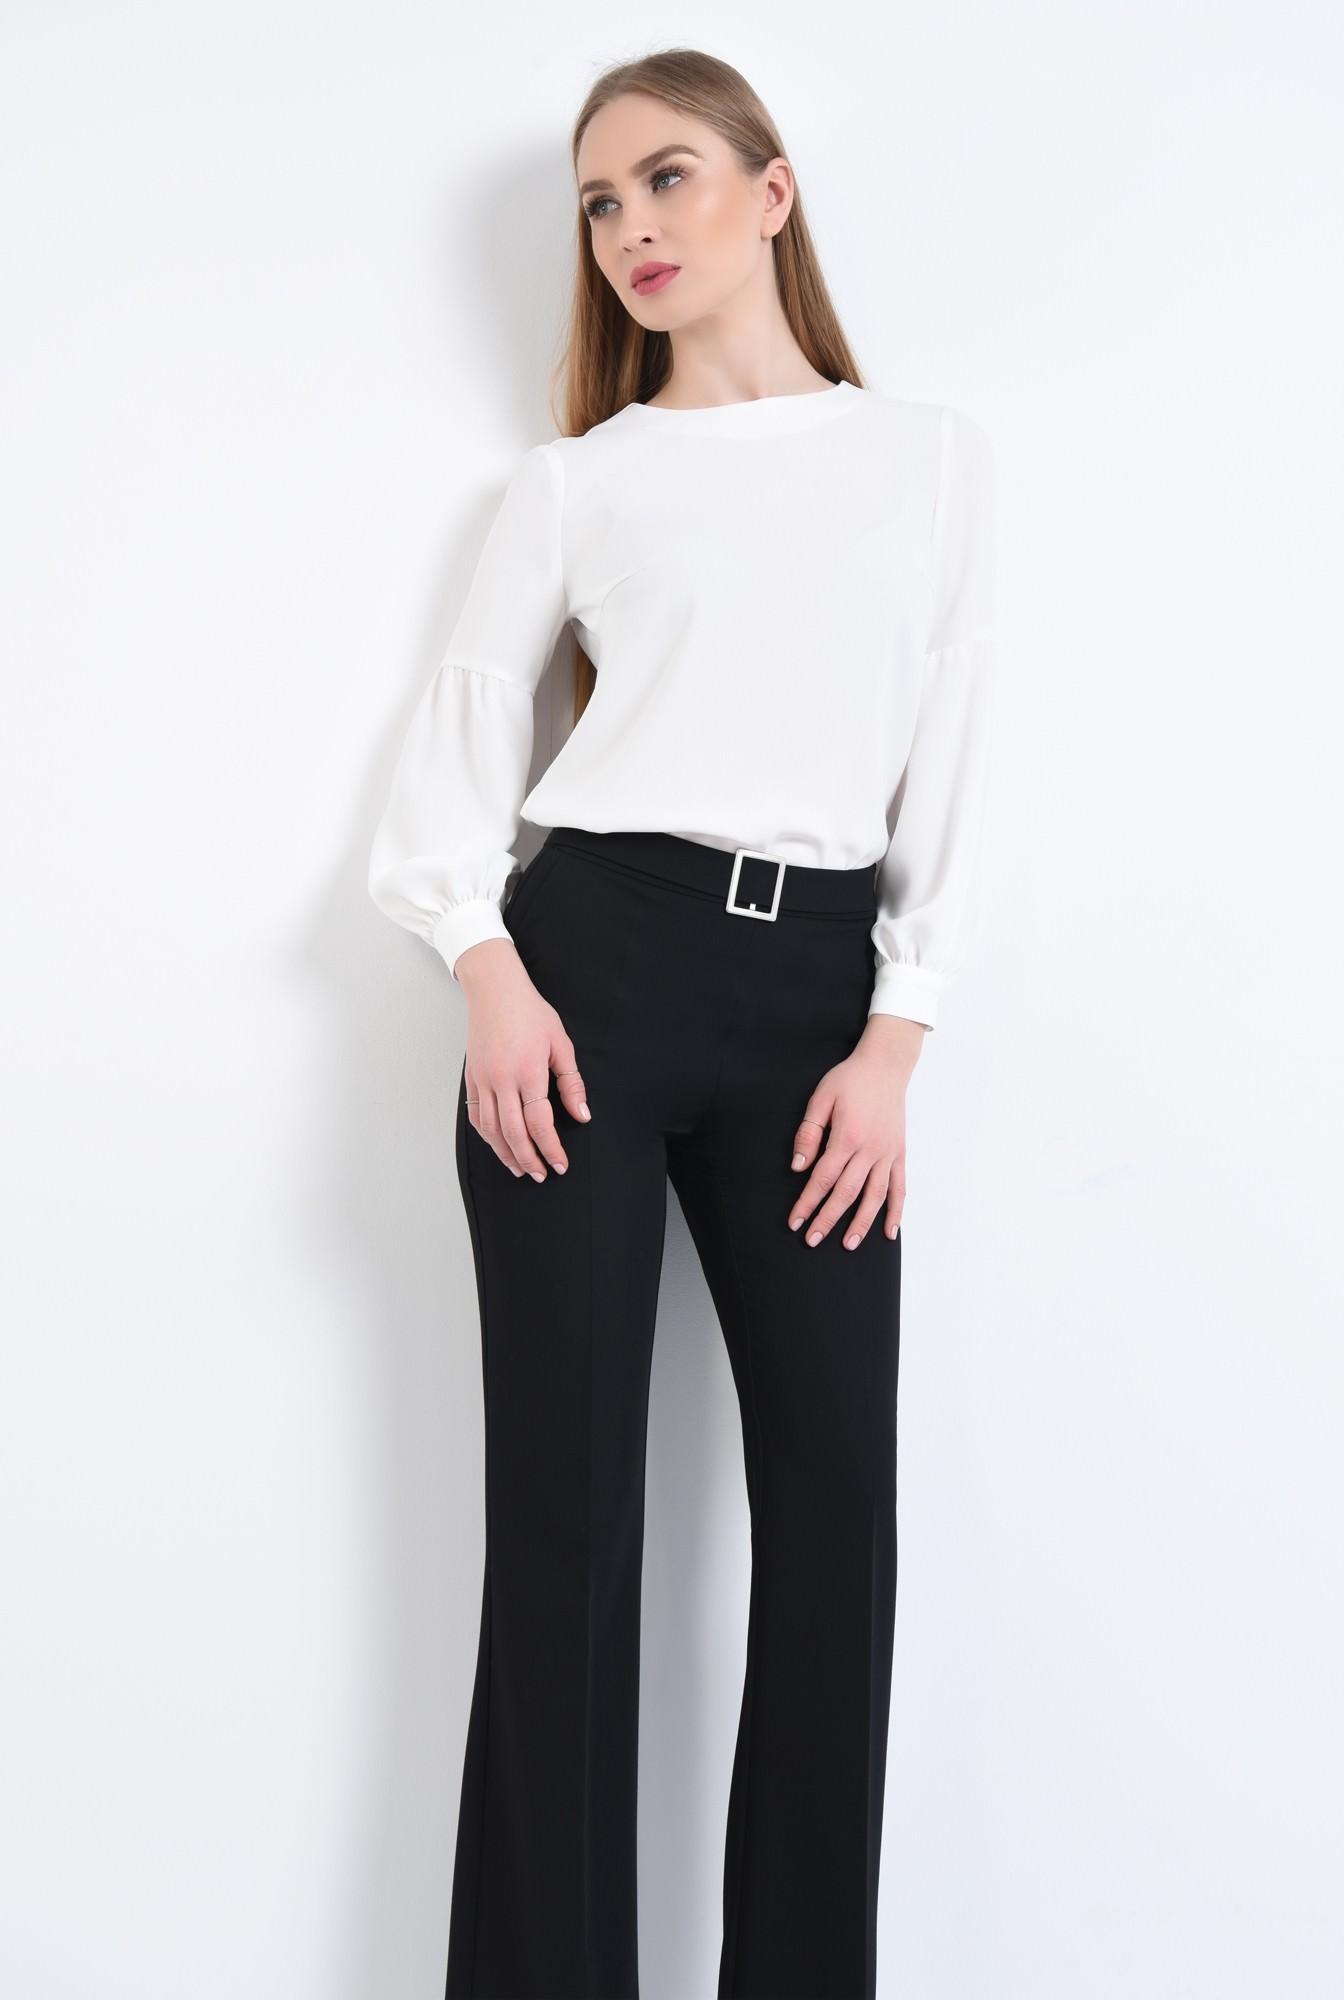 3 - Bluza casual, alb, maneci bufante